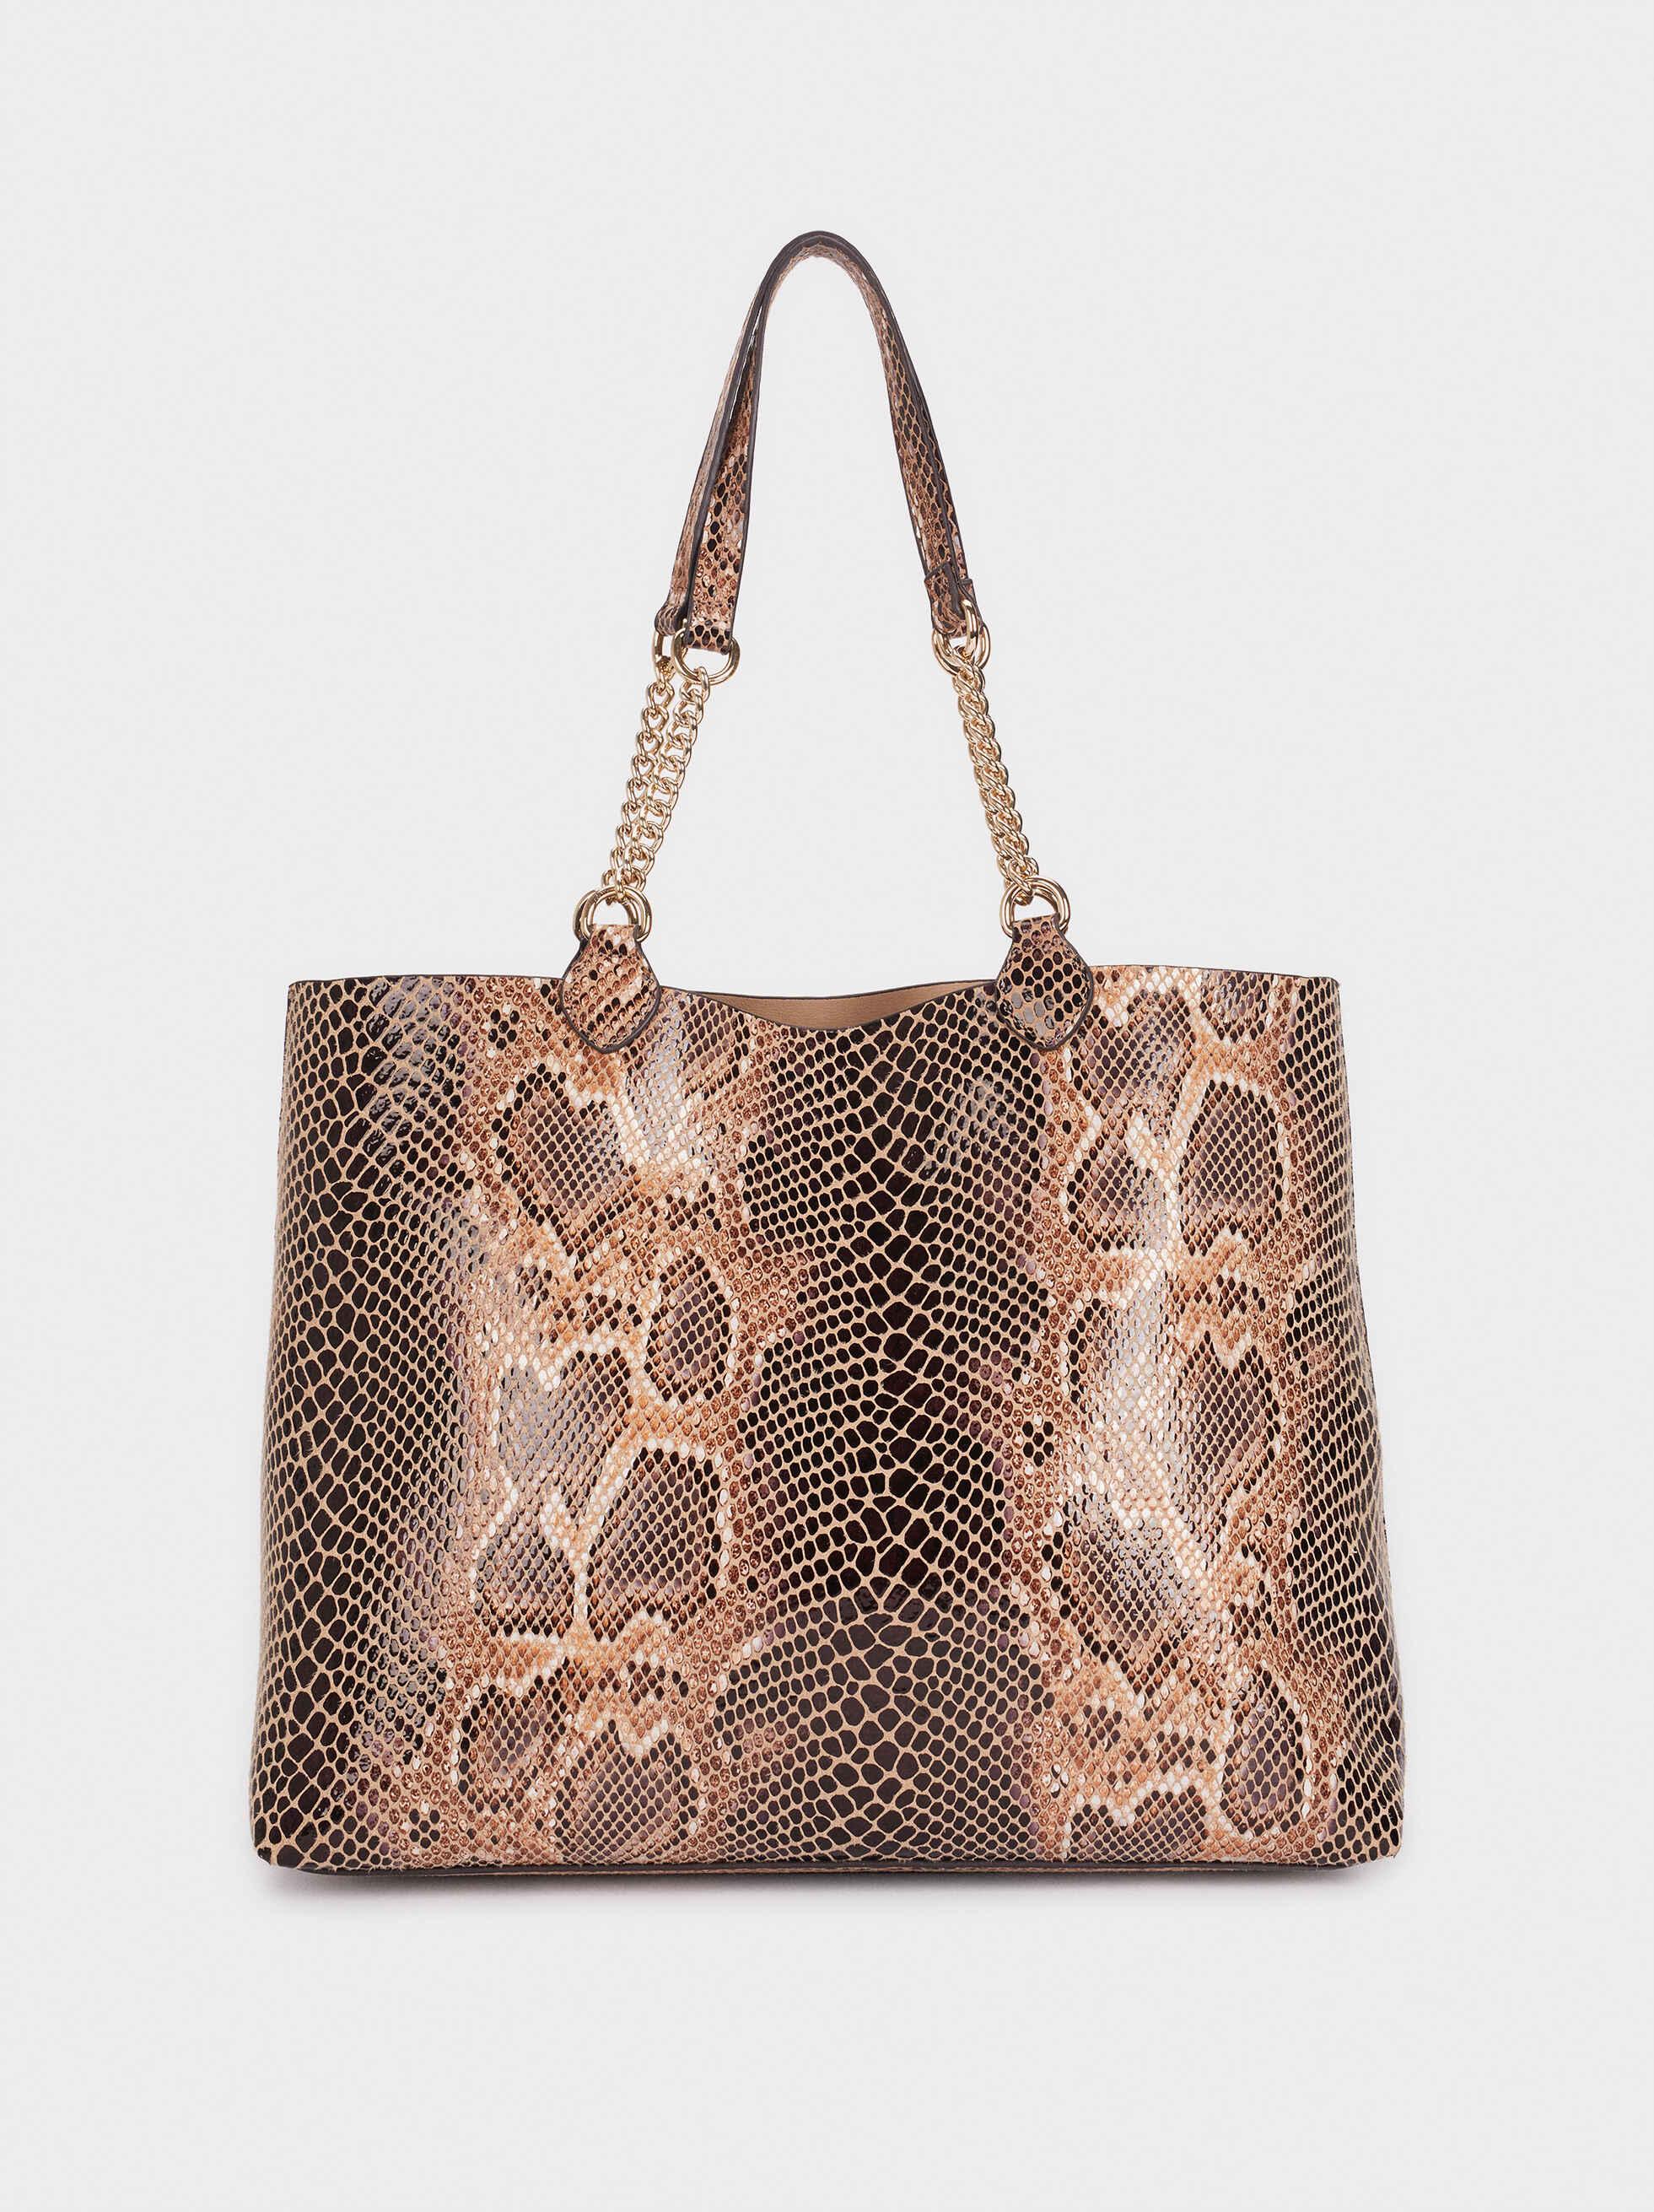 Bolso Shopper Grabado Animal, Beige, hi-res